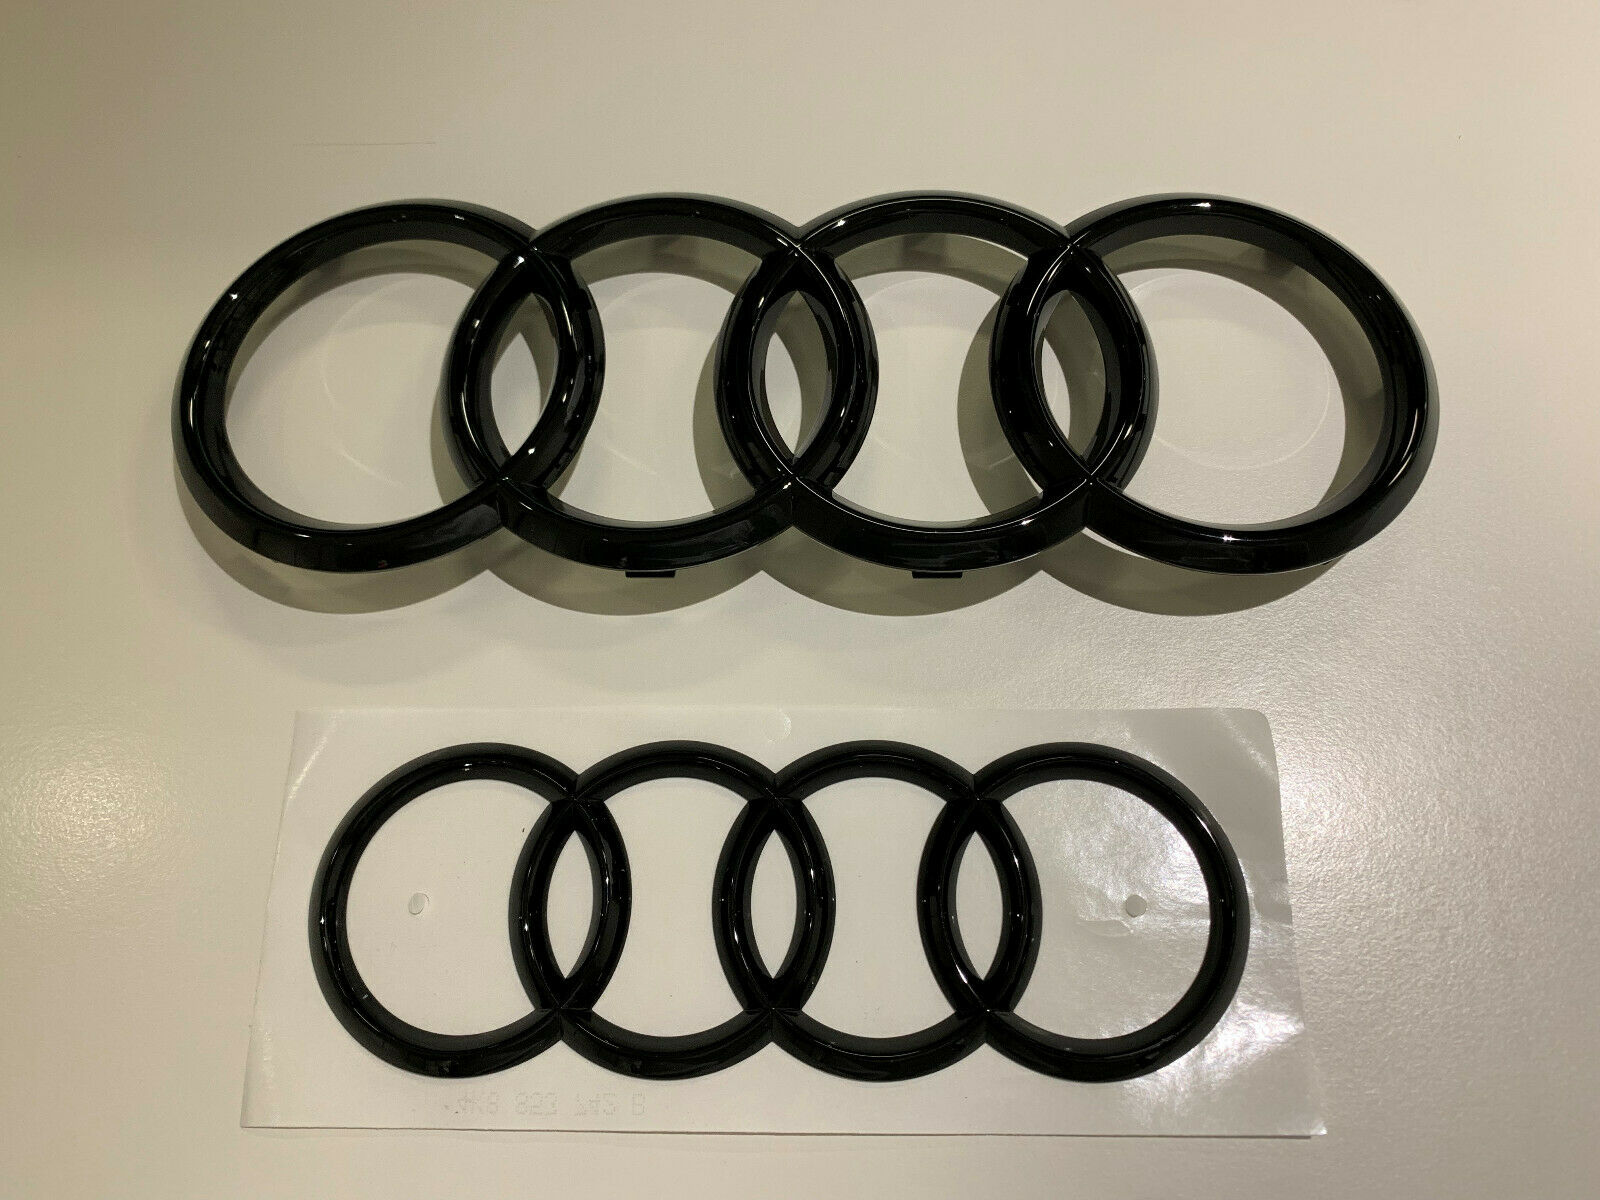 Original Audi Black Edition Ringe Schwarz Kühlergrill für Audi A1 A3 A4 A5 A6 A7